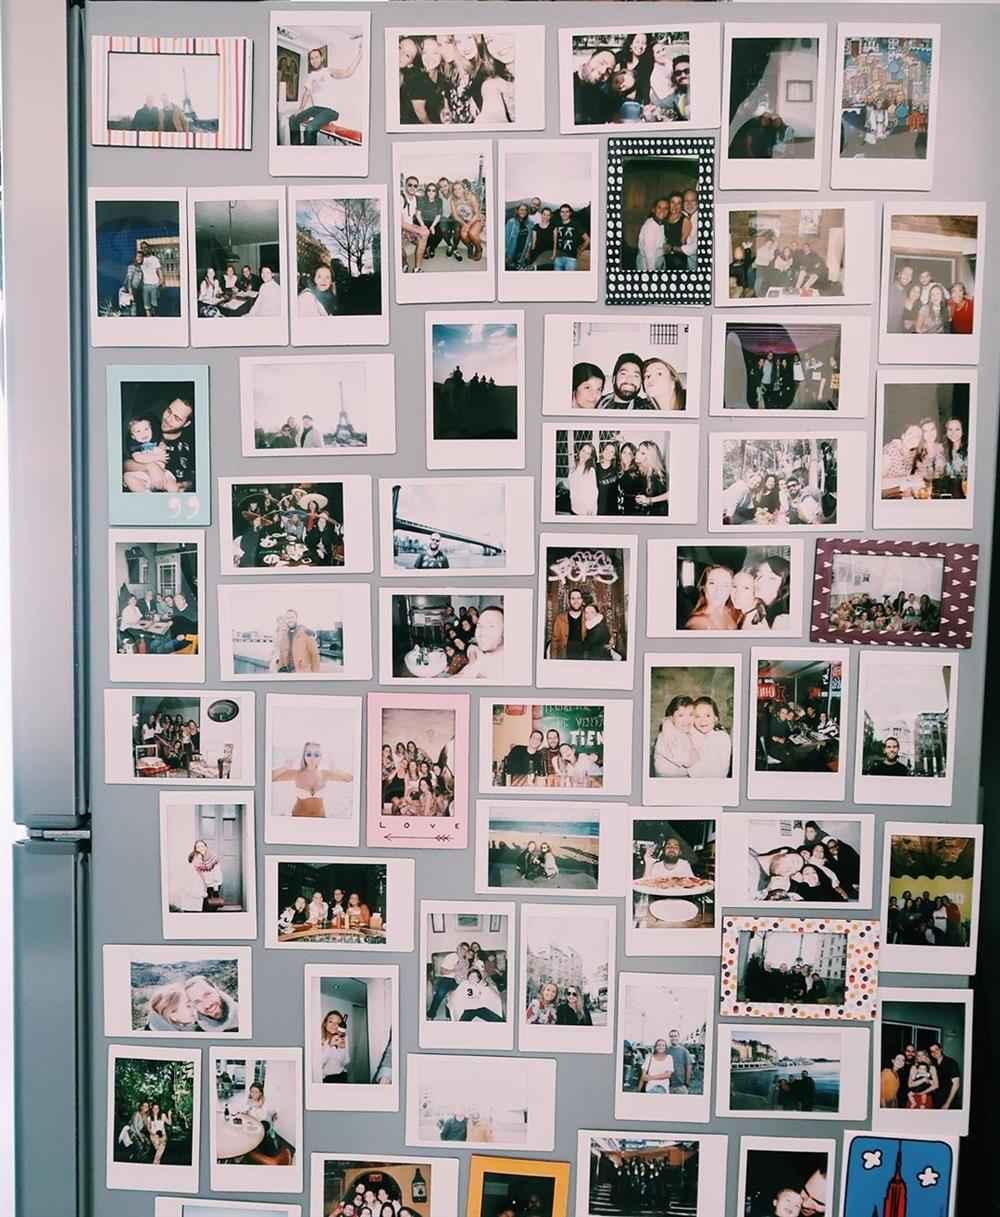 Mural de fotos na geladeira